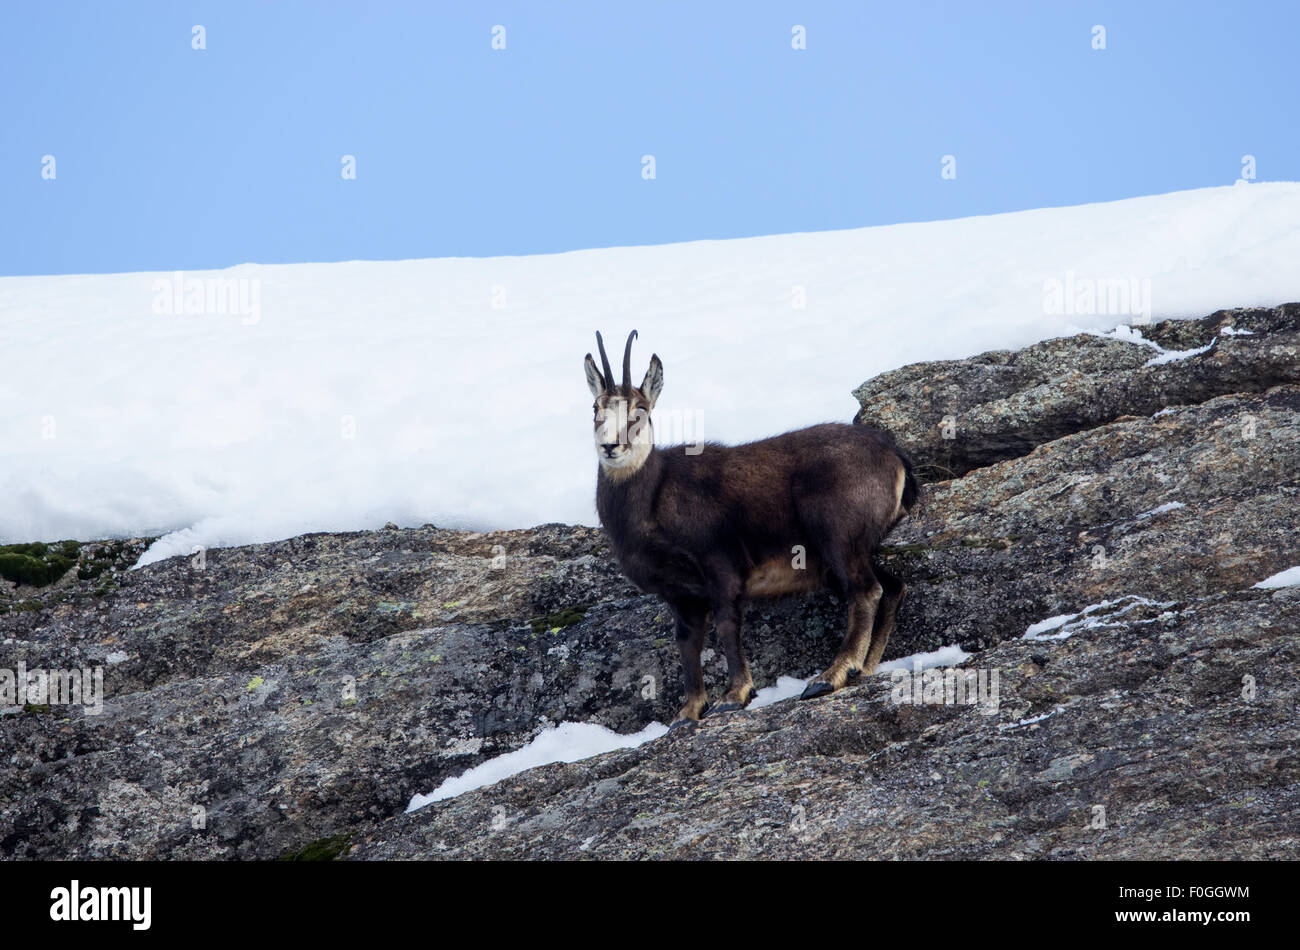 ibex, italian ibex, ibex of alps, ibex closeup - Stock Image